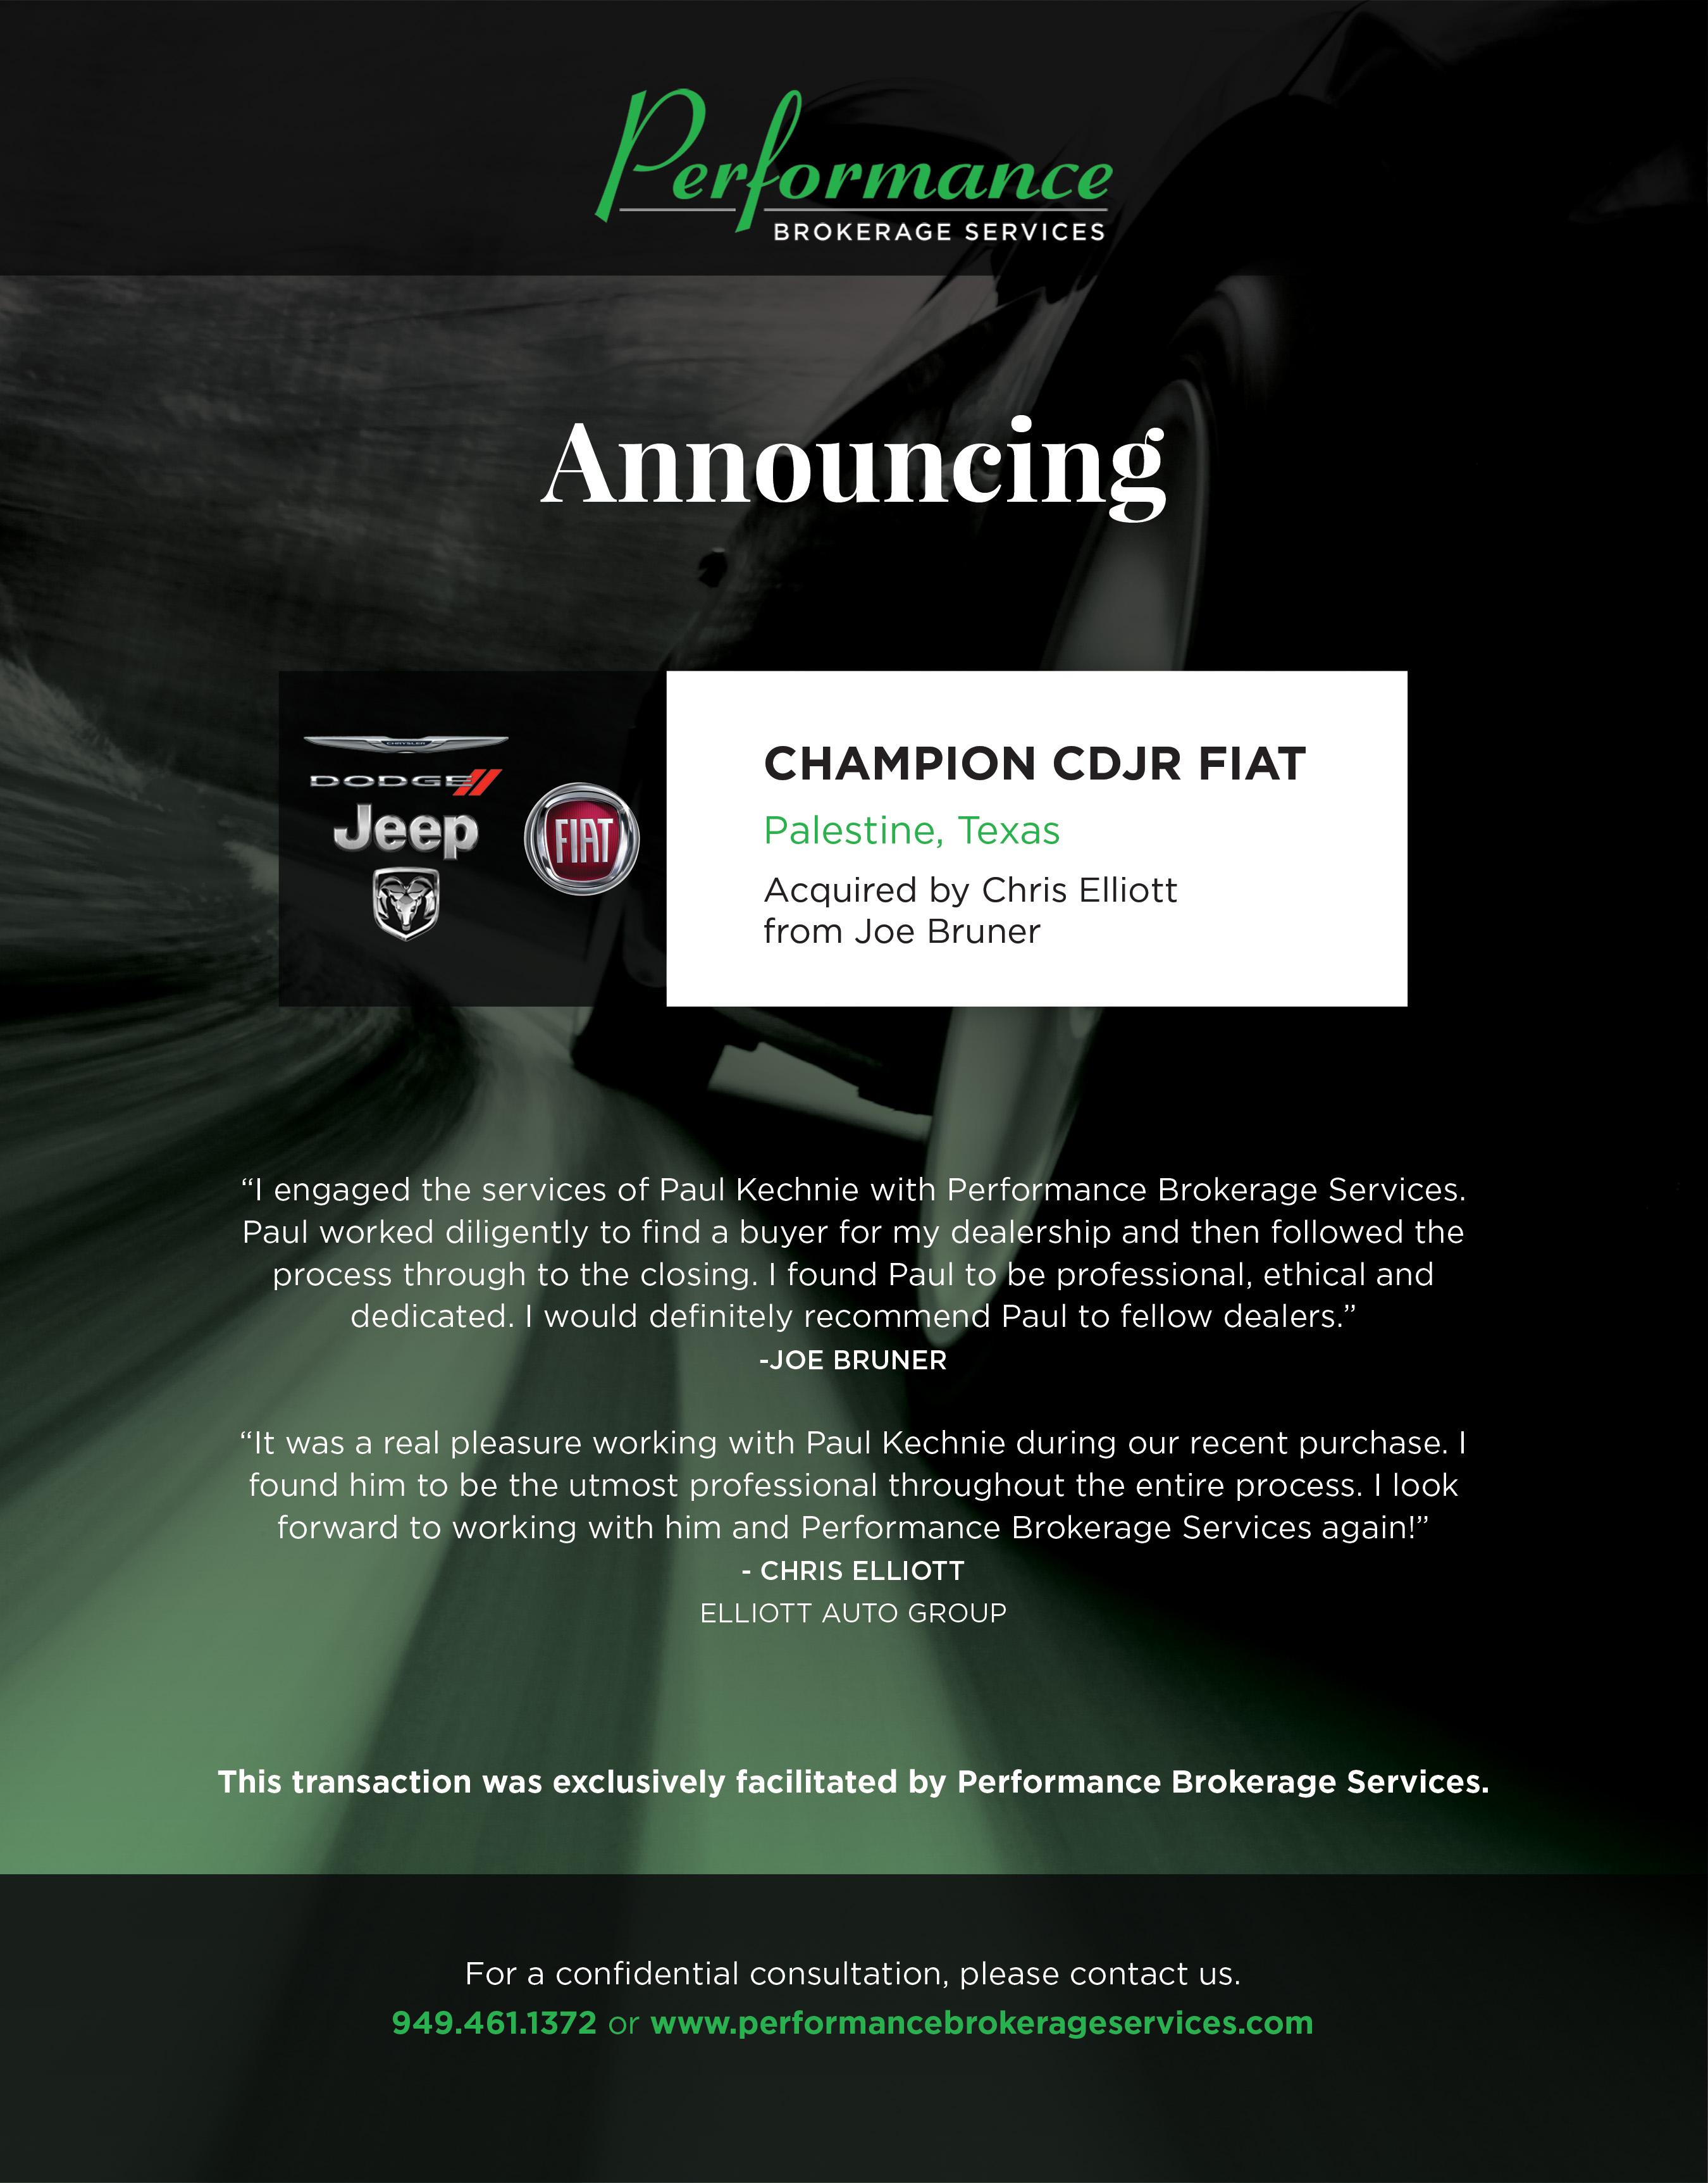 Joe Bruner Sells Champion CDJR Fiat Of Palestine Texas - Champion chrysler dodge jeep